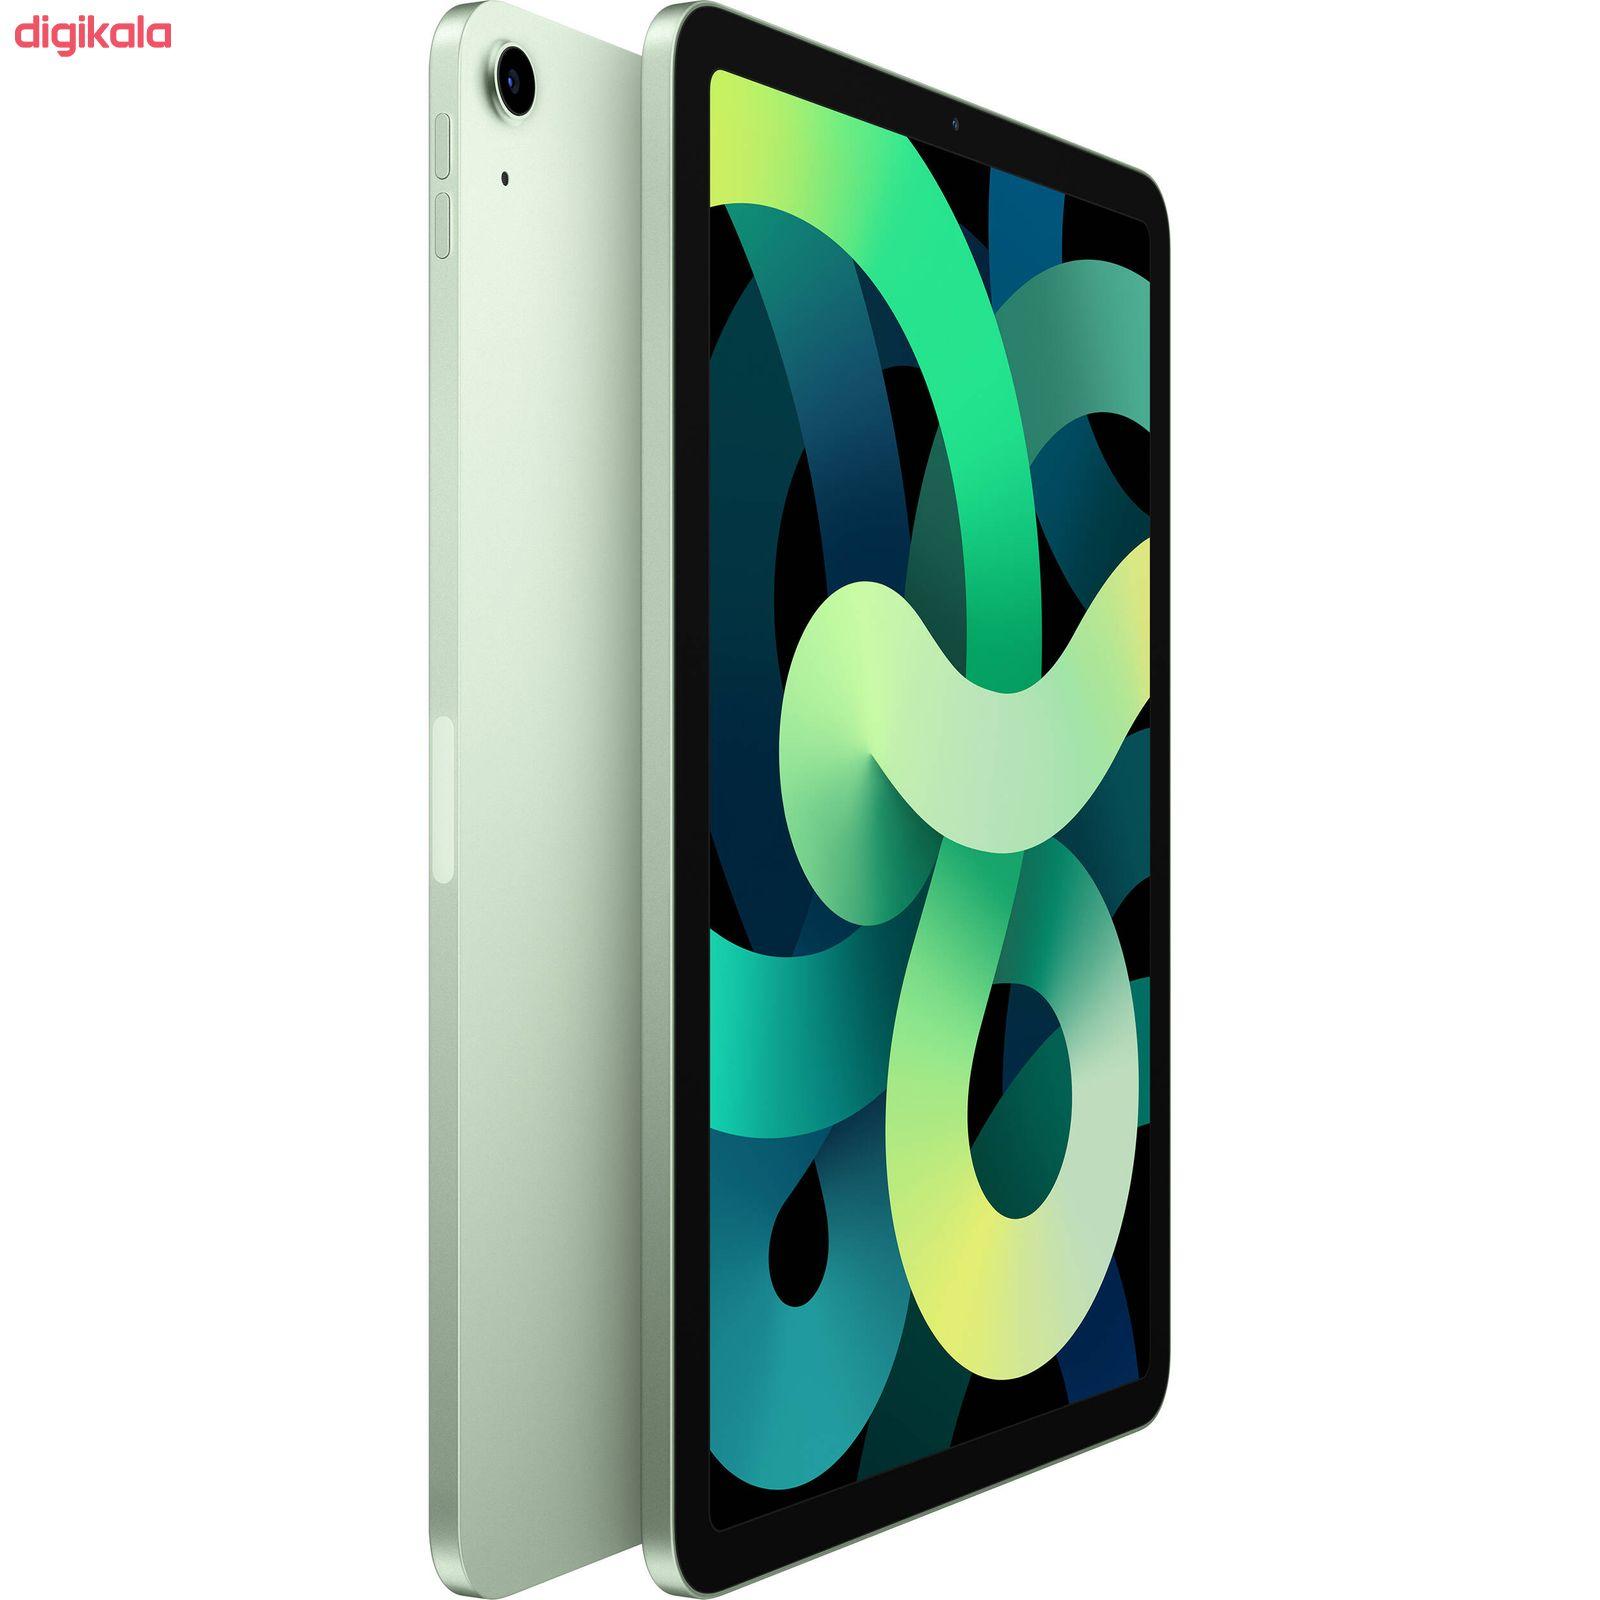 تبلت اپل مدل iPad Air 10.9 inch 2020 WiFi ظرفیت 256 گیگابایت  main 1 8